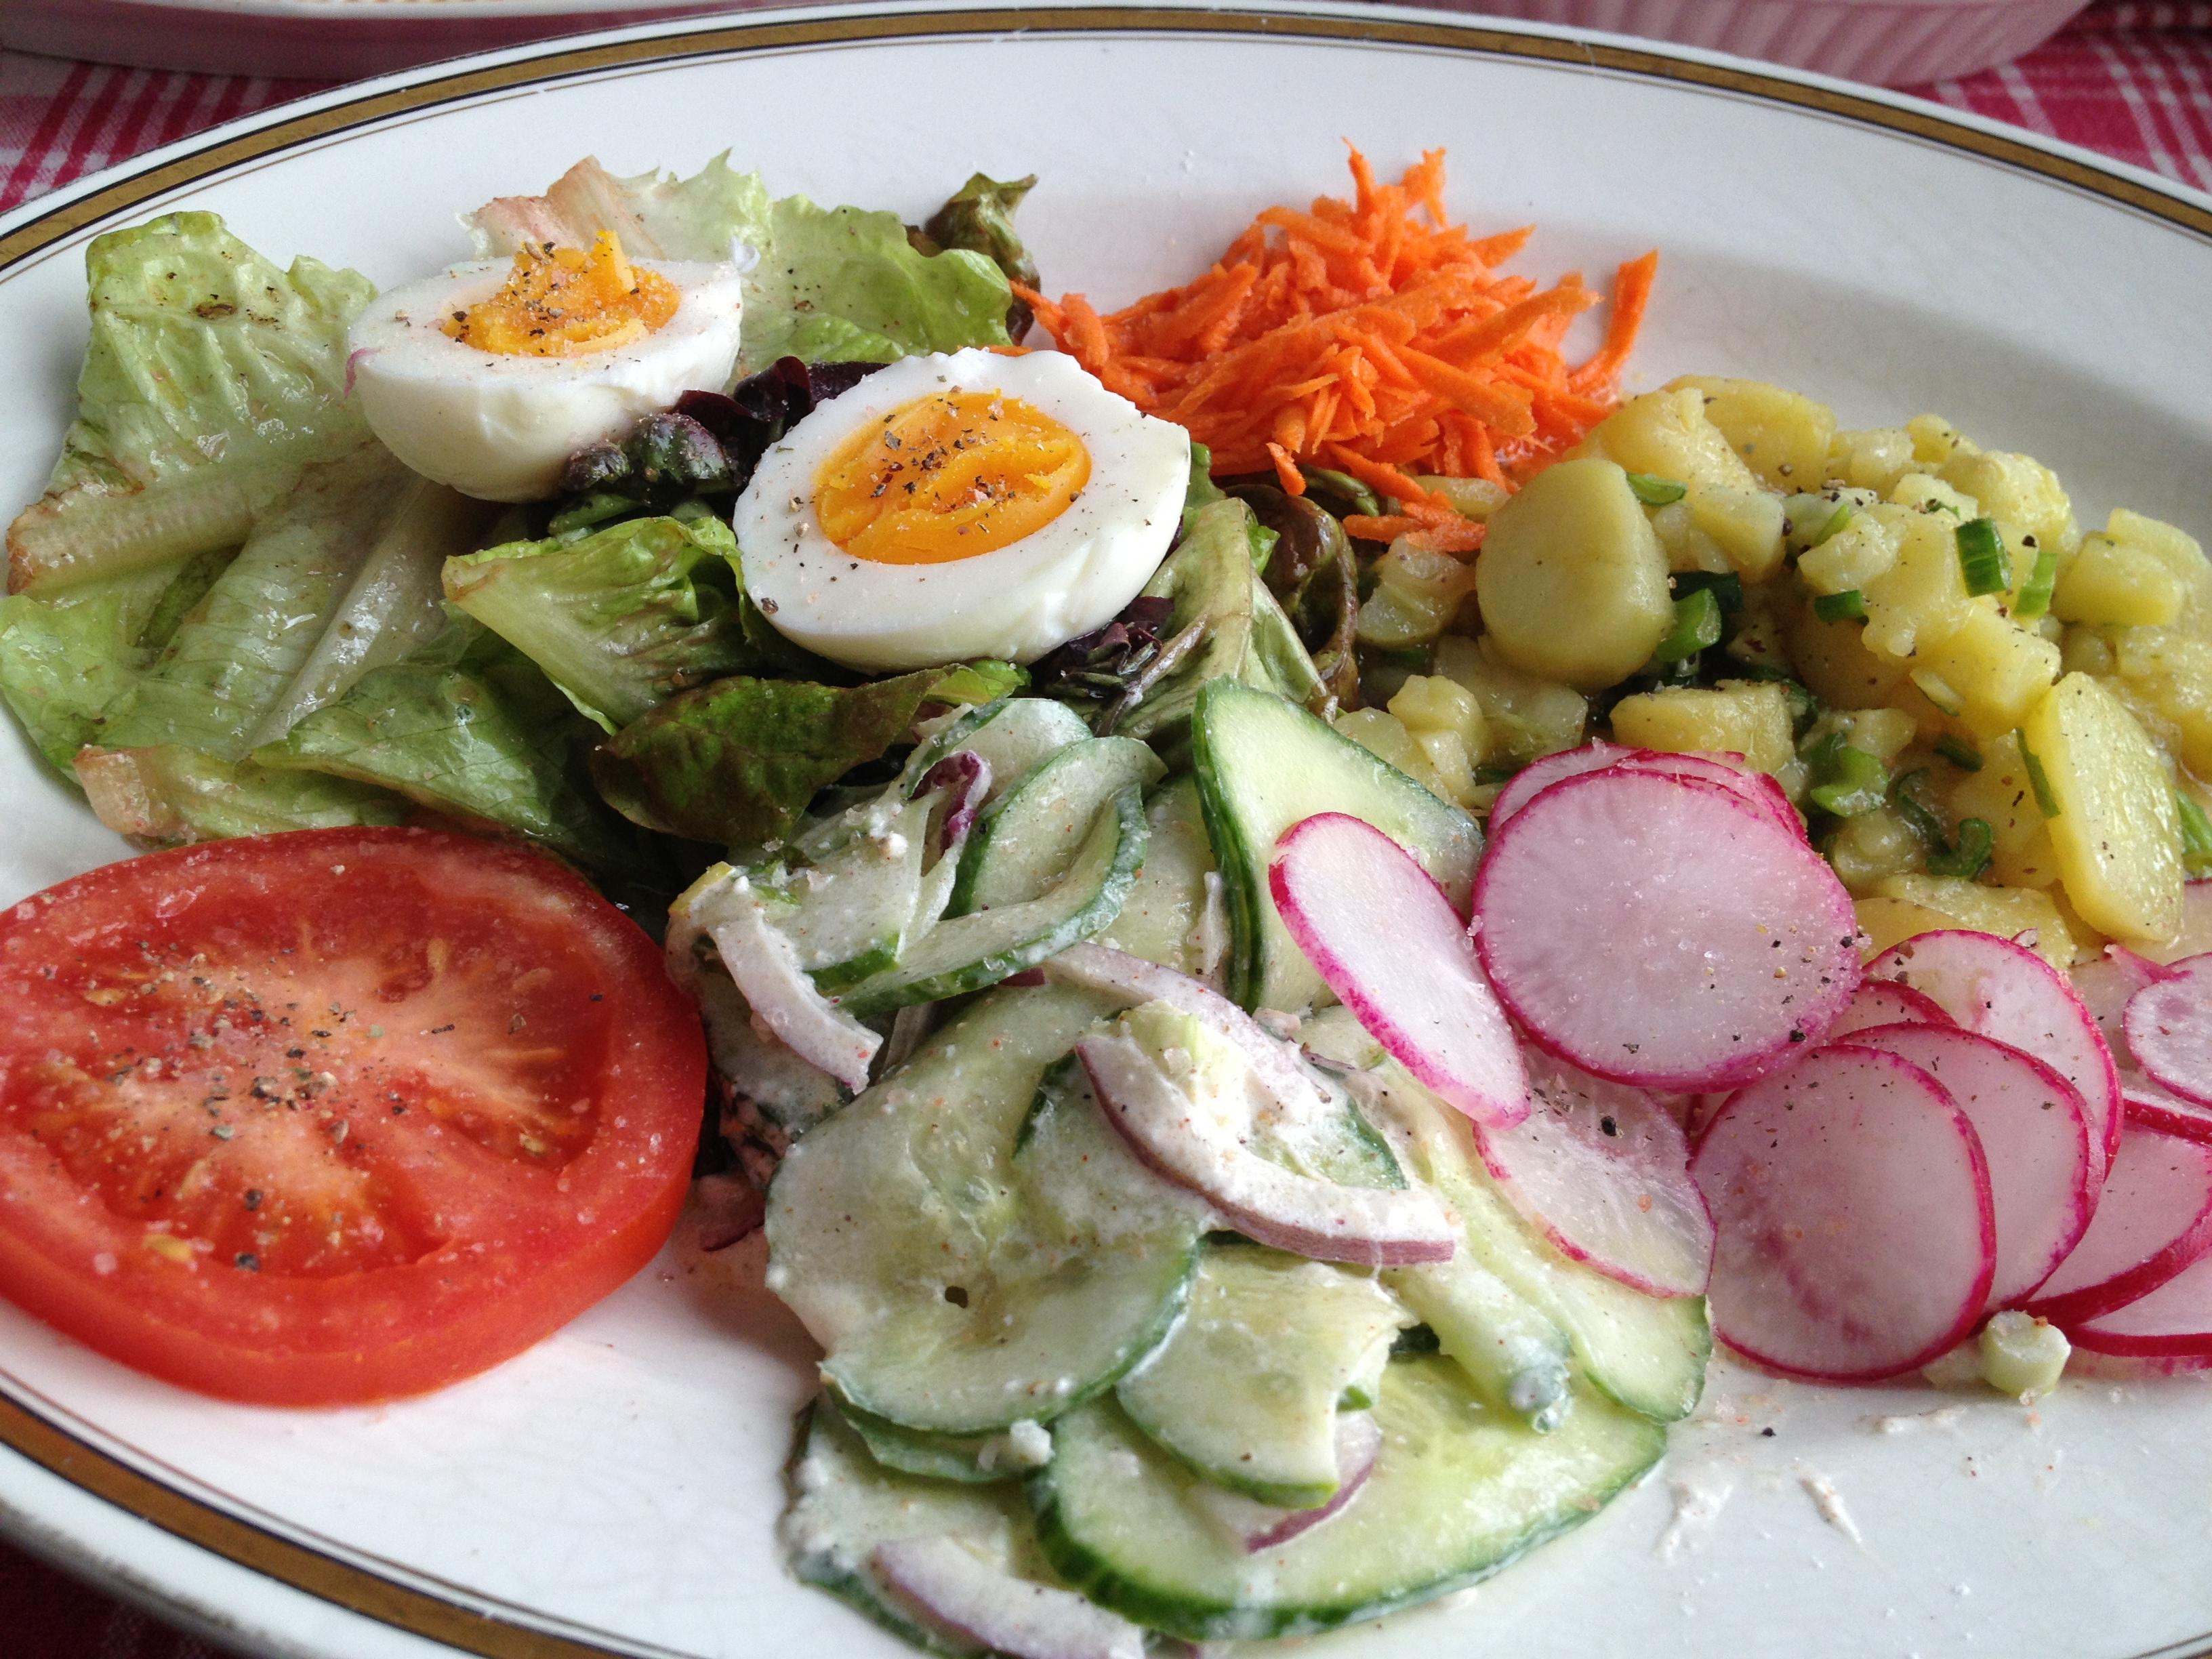 Bunter Colorful Salad